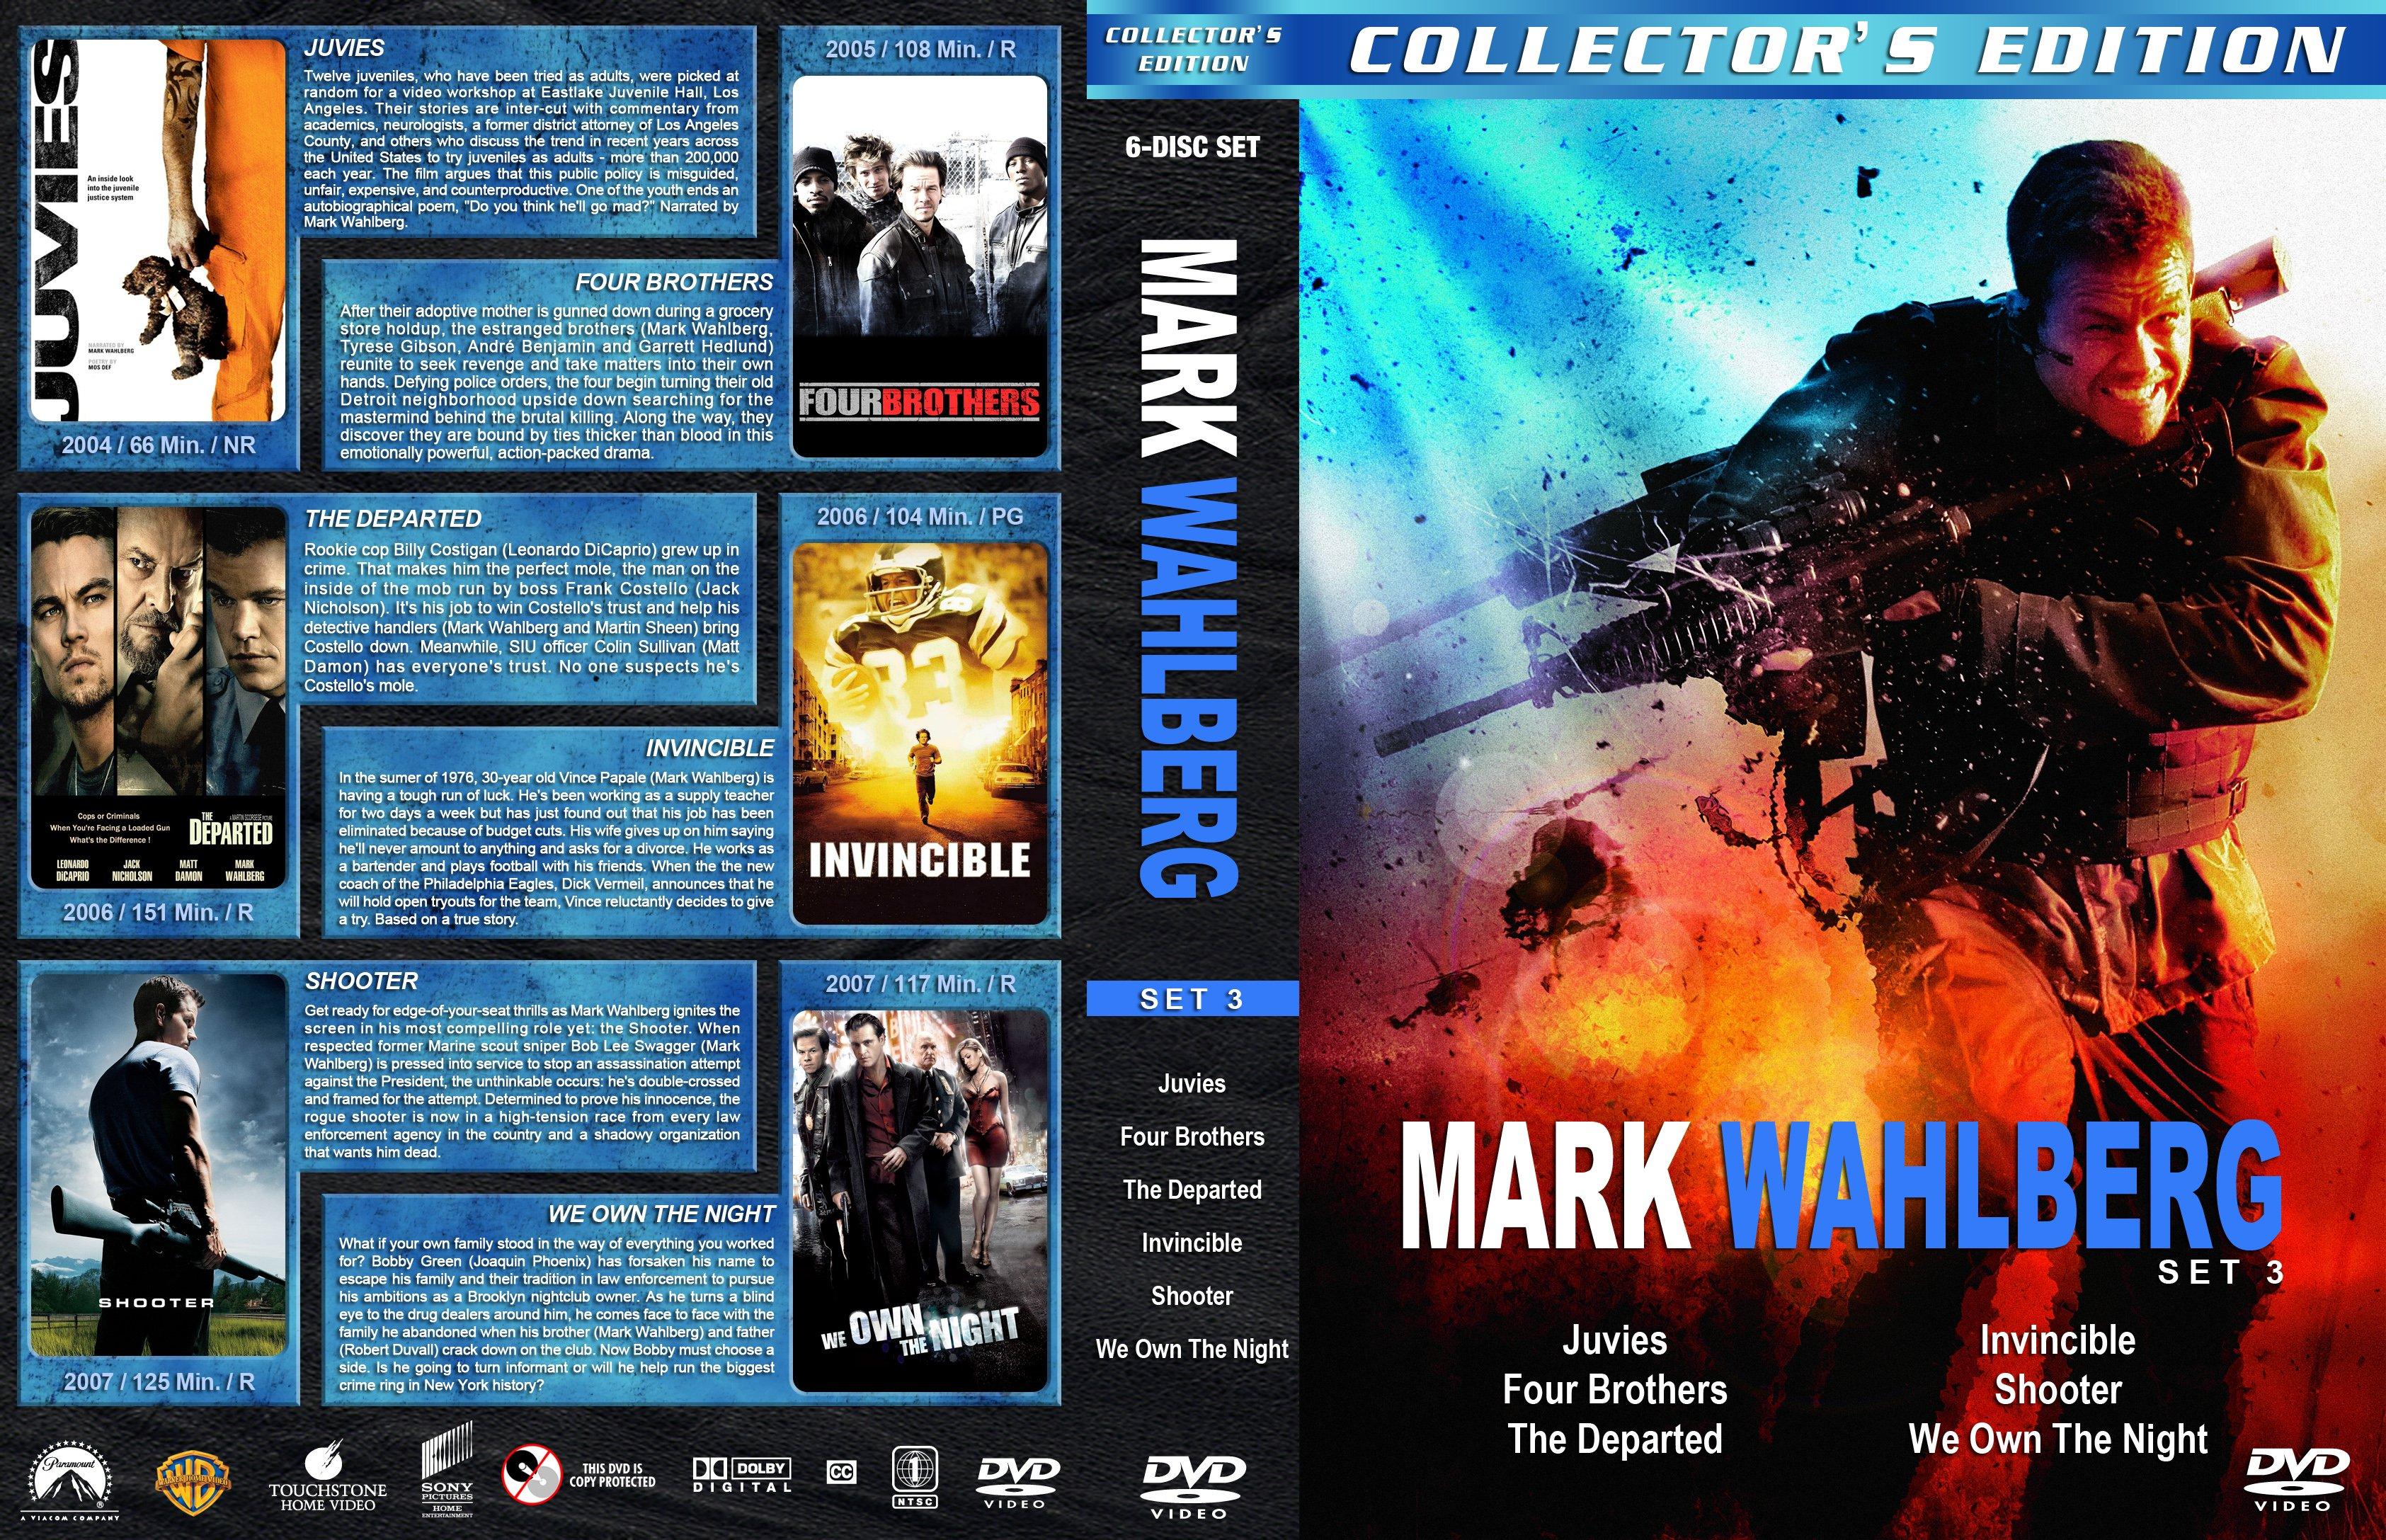 Mark wahlberg 2007 movie